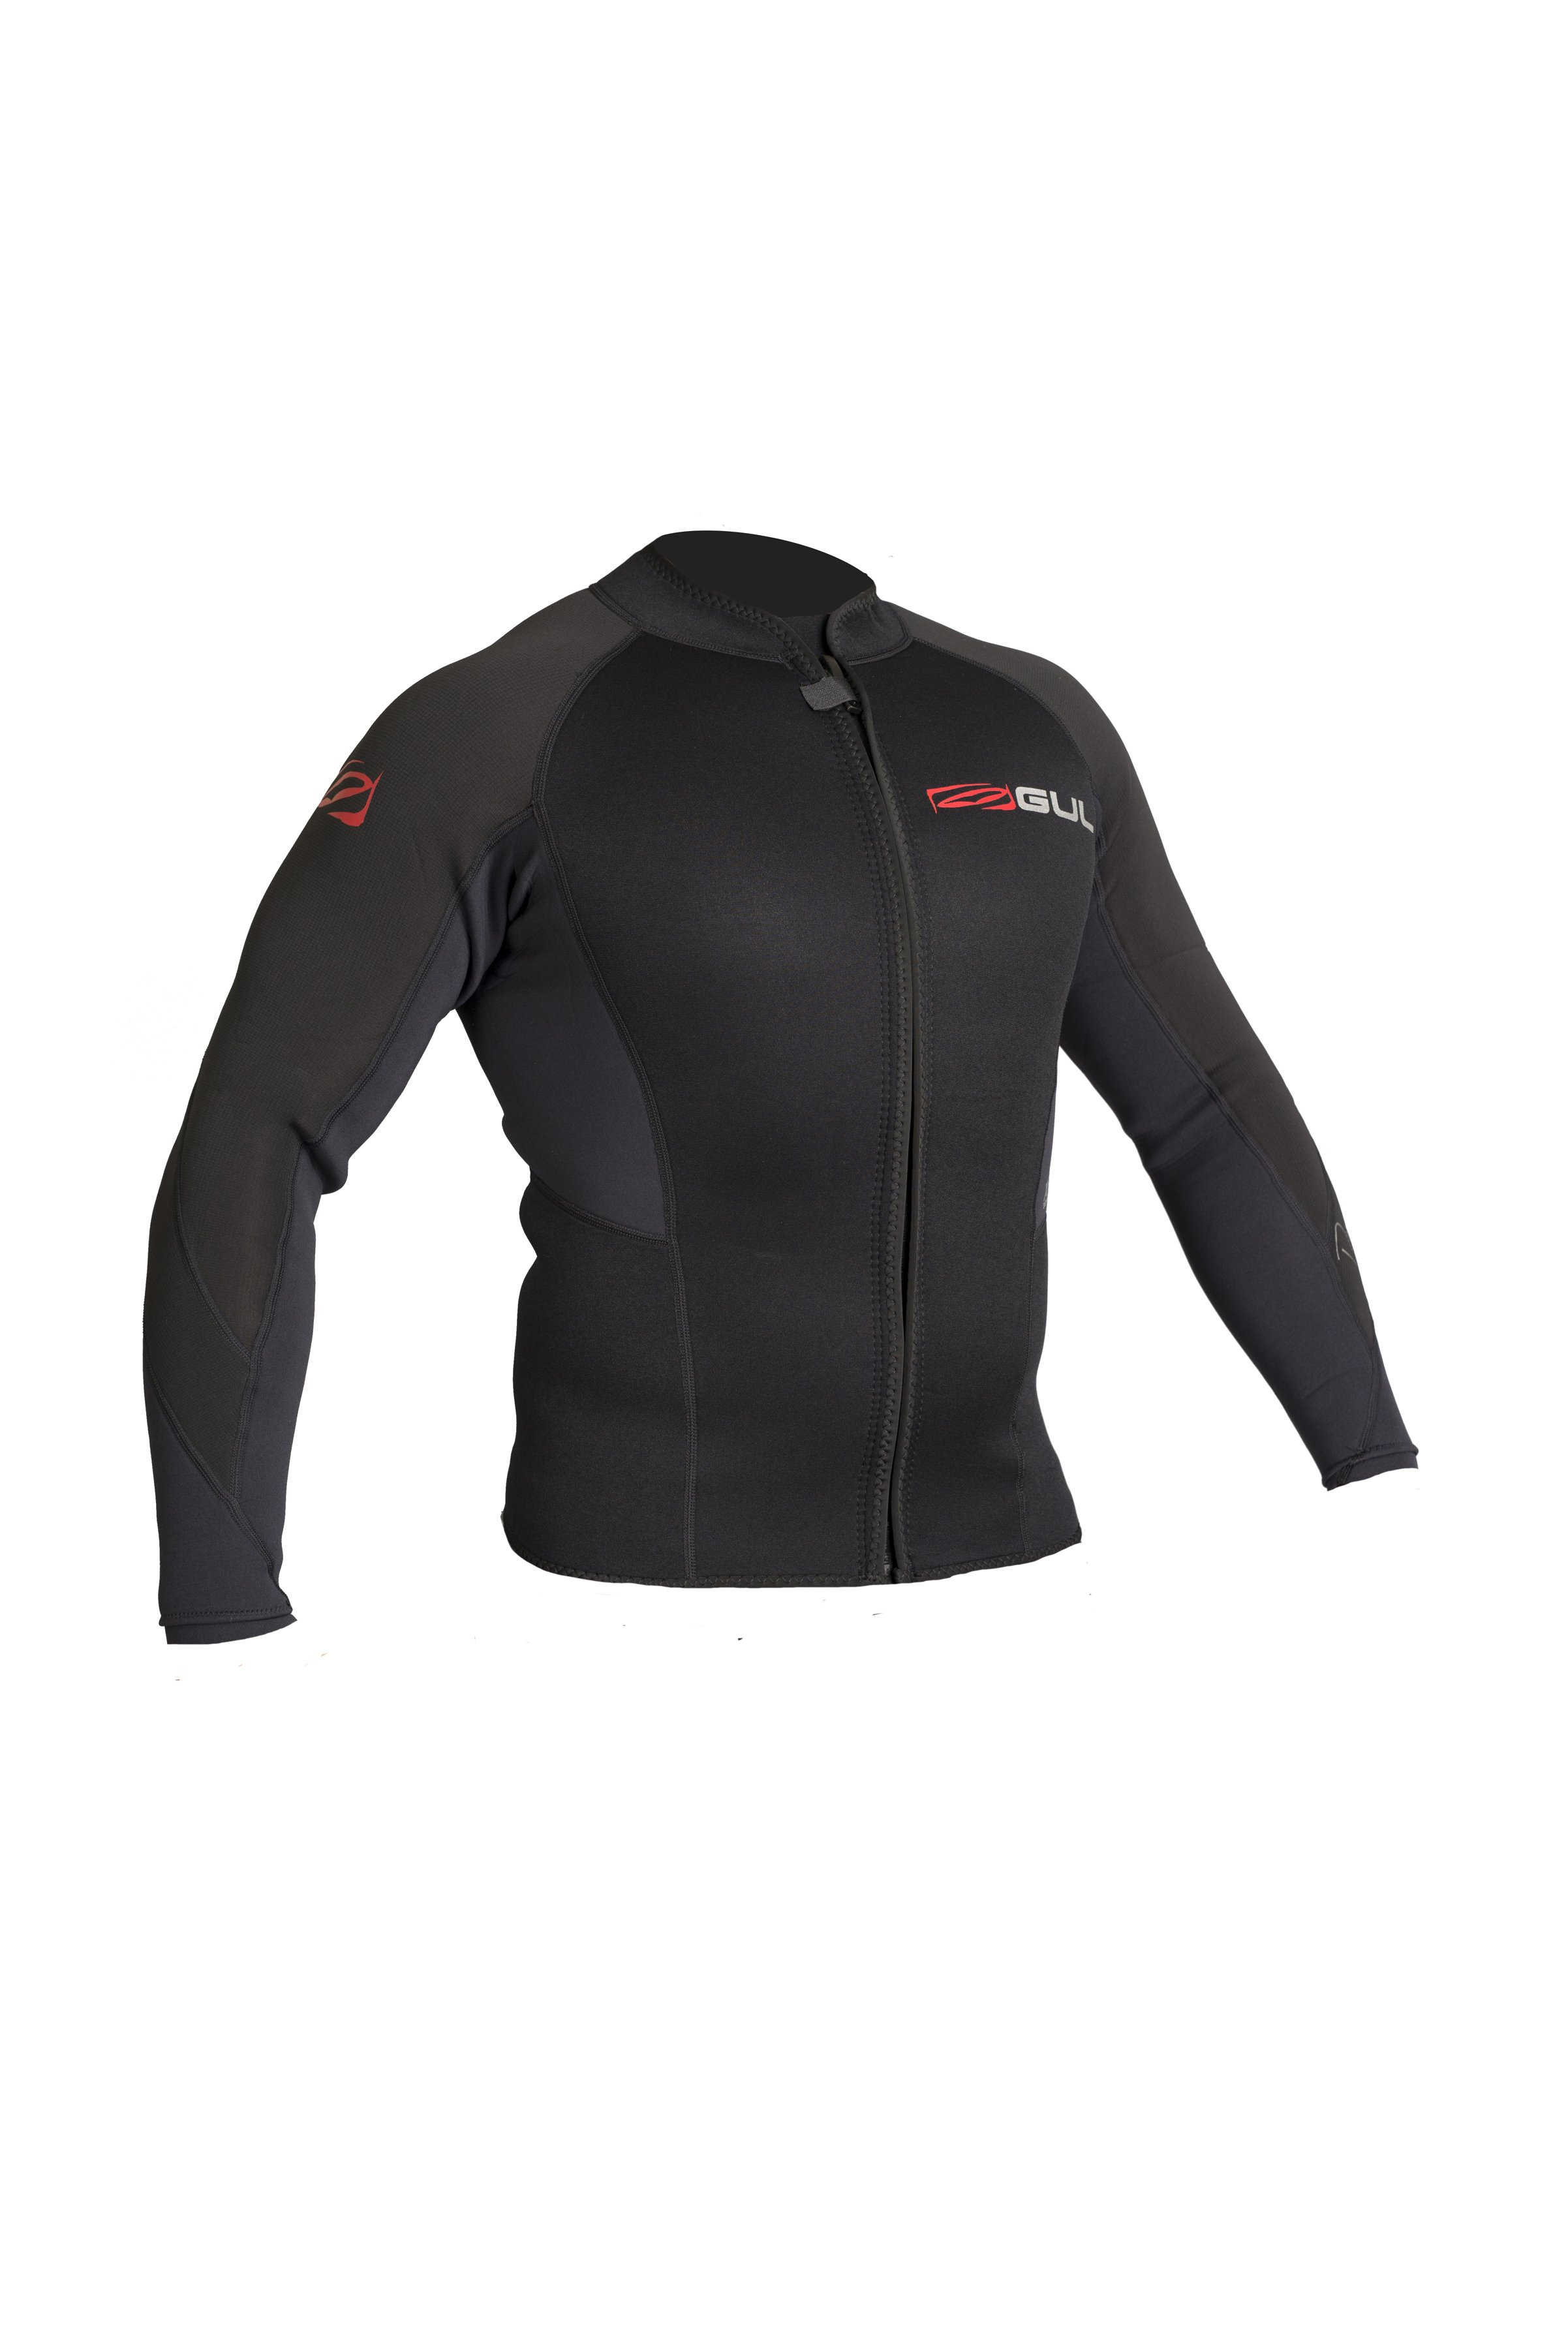 Gul Response 3mm Fl Wetsuit Jacket  Re6304-B4